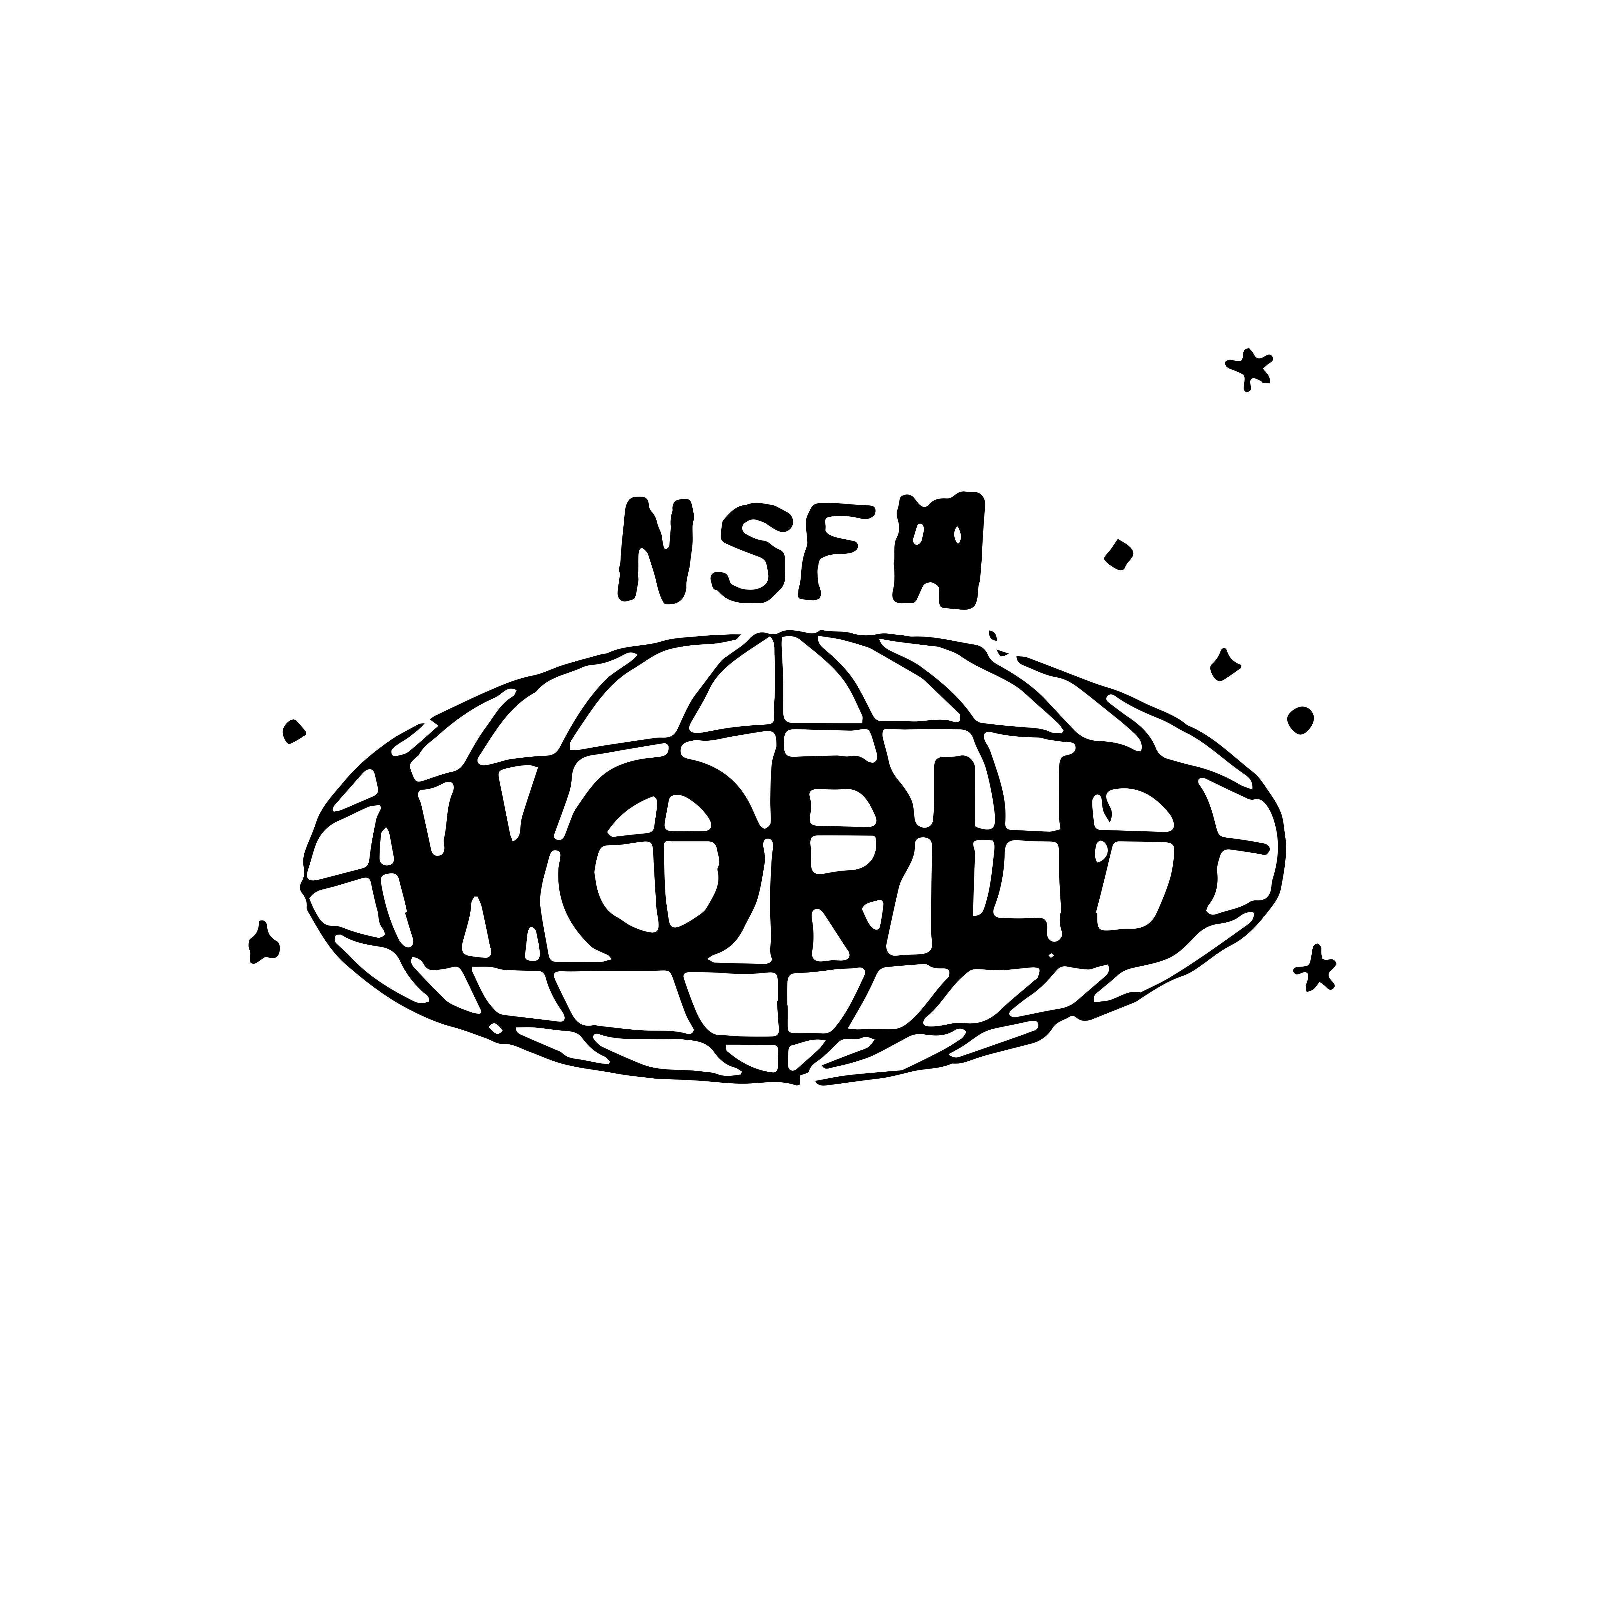 NSFW WORLD